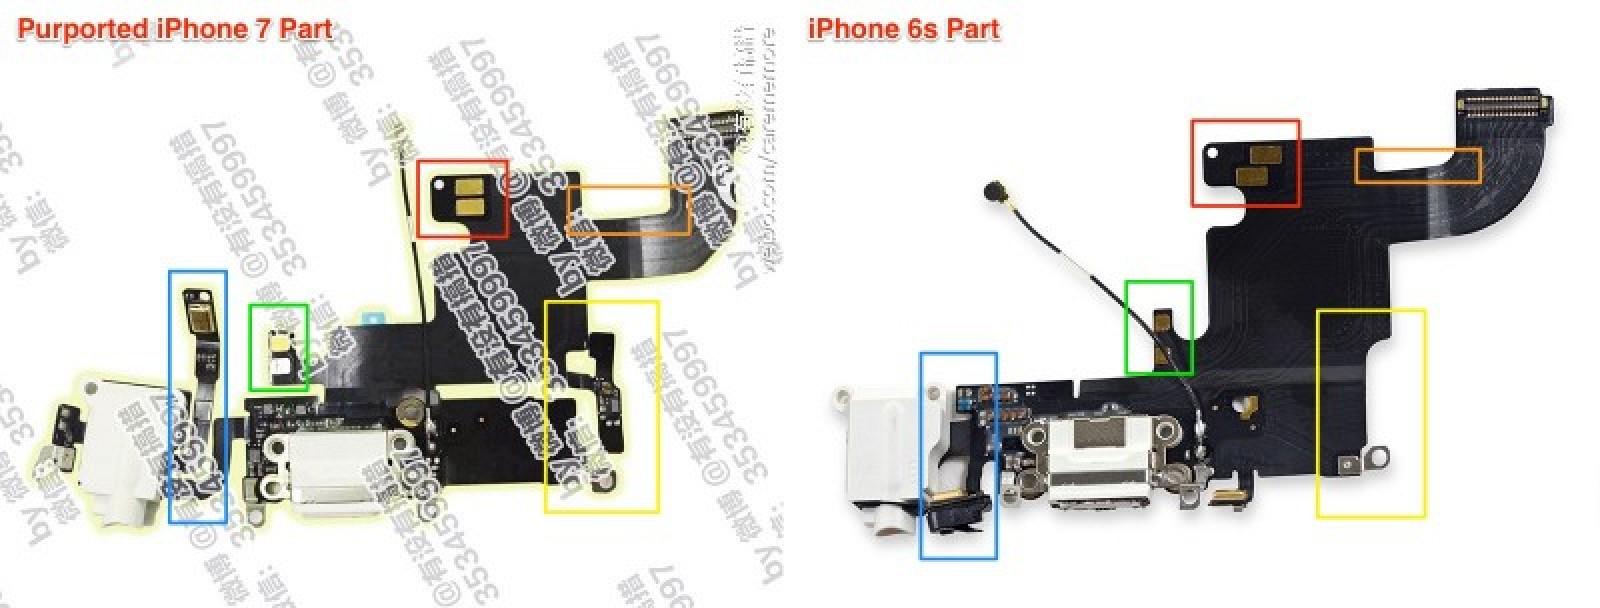 Jack-iPhone7-vs-iPhone6s-HighLights-800x304